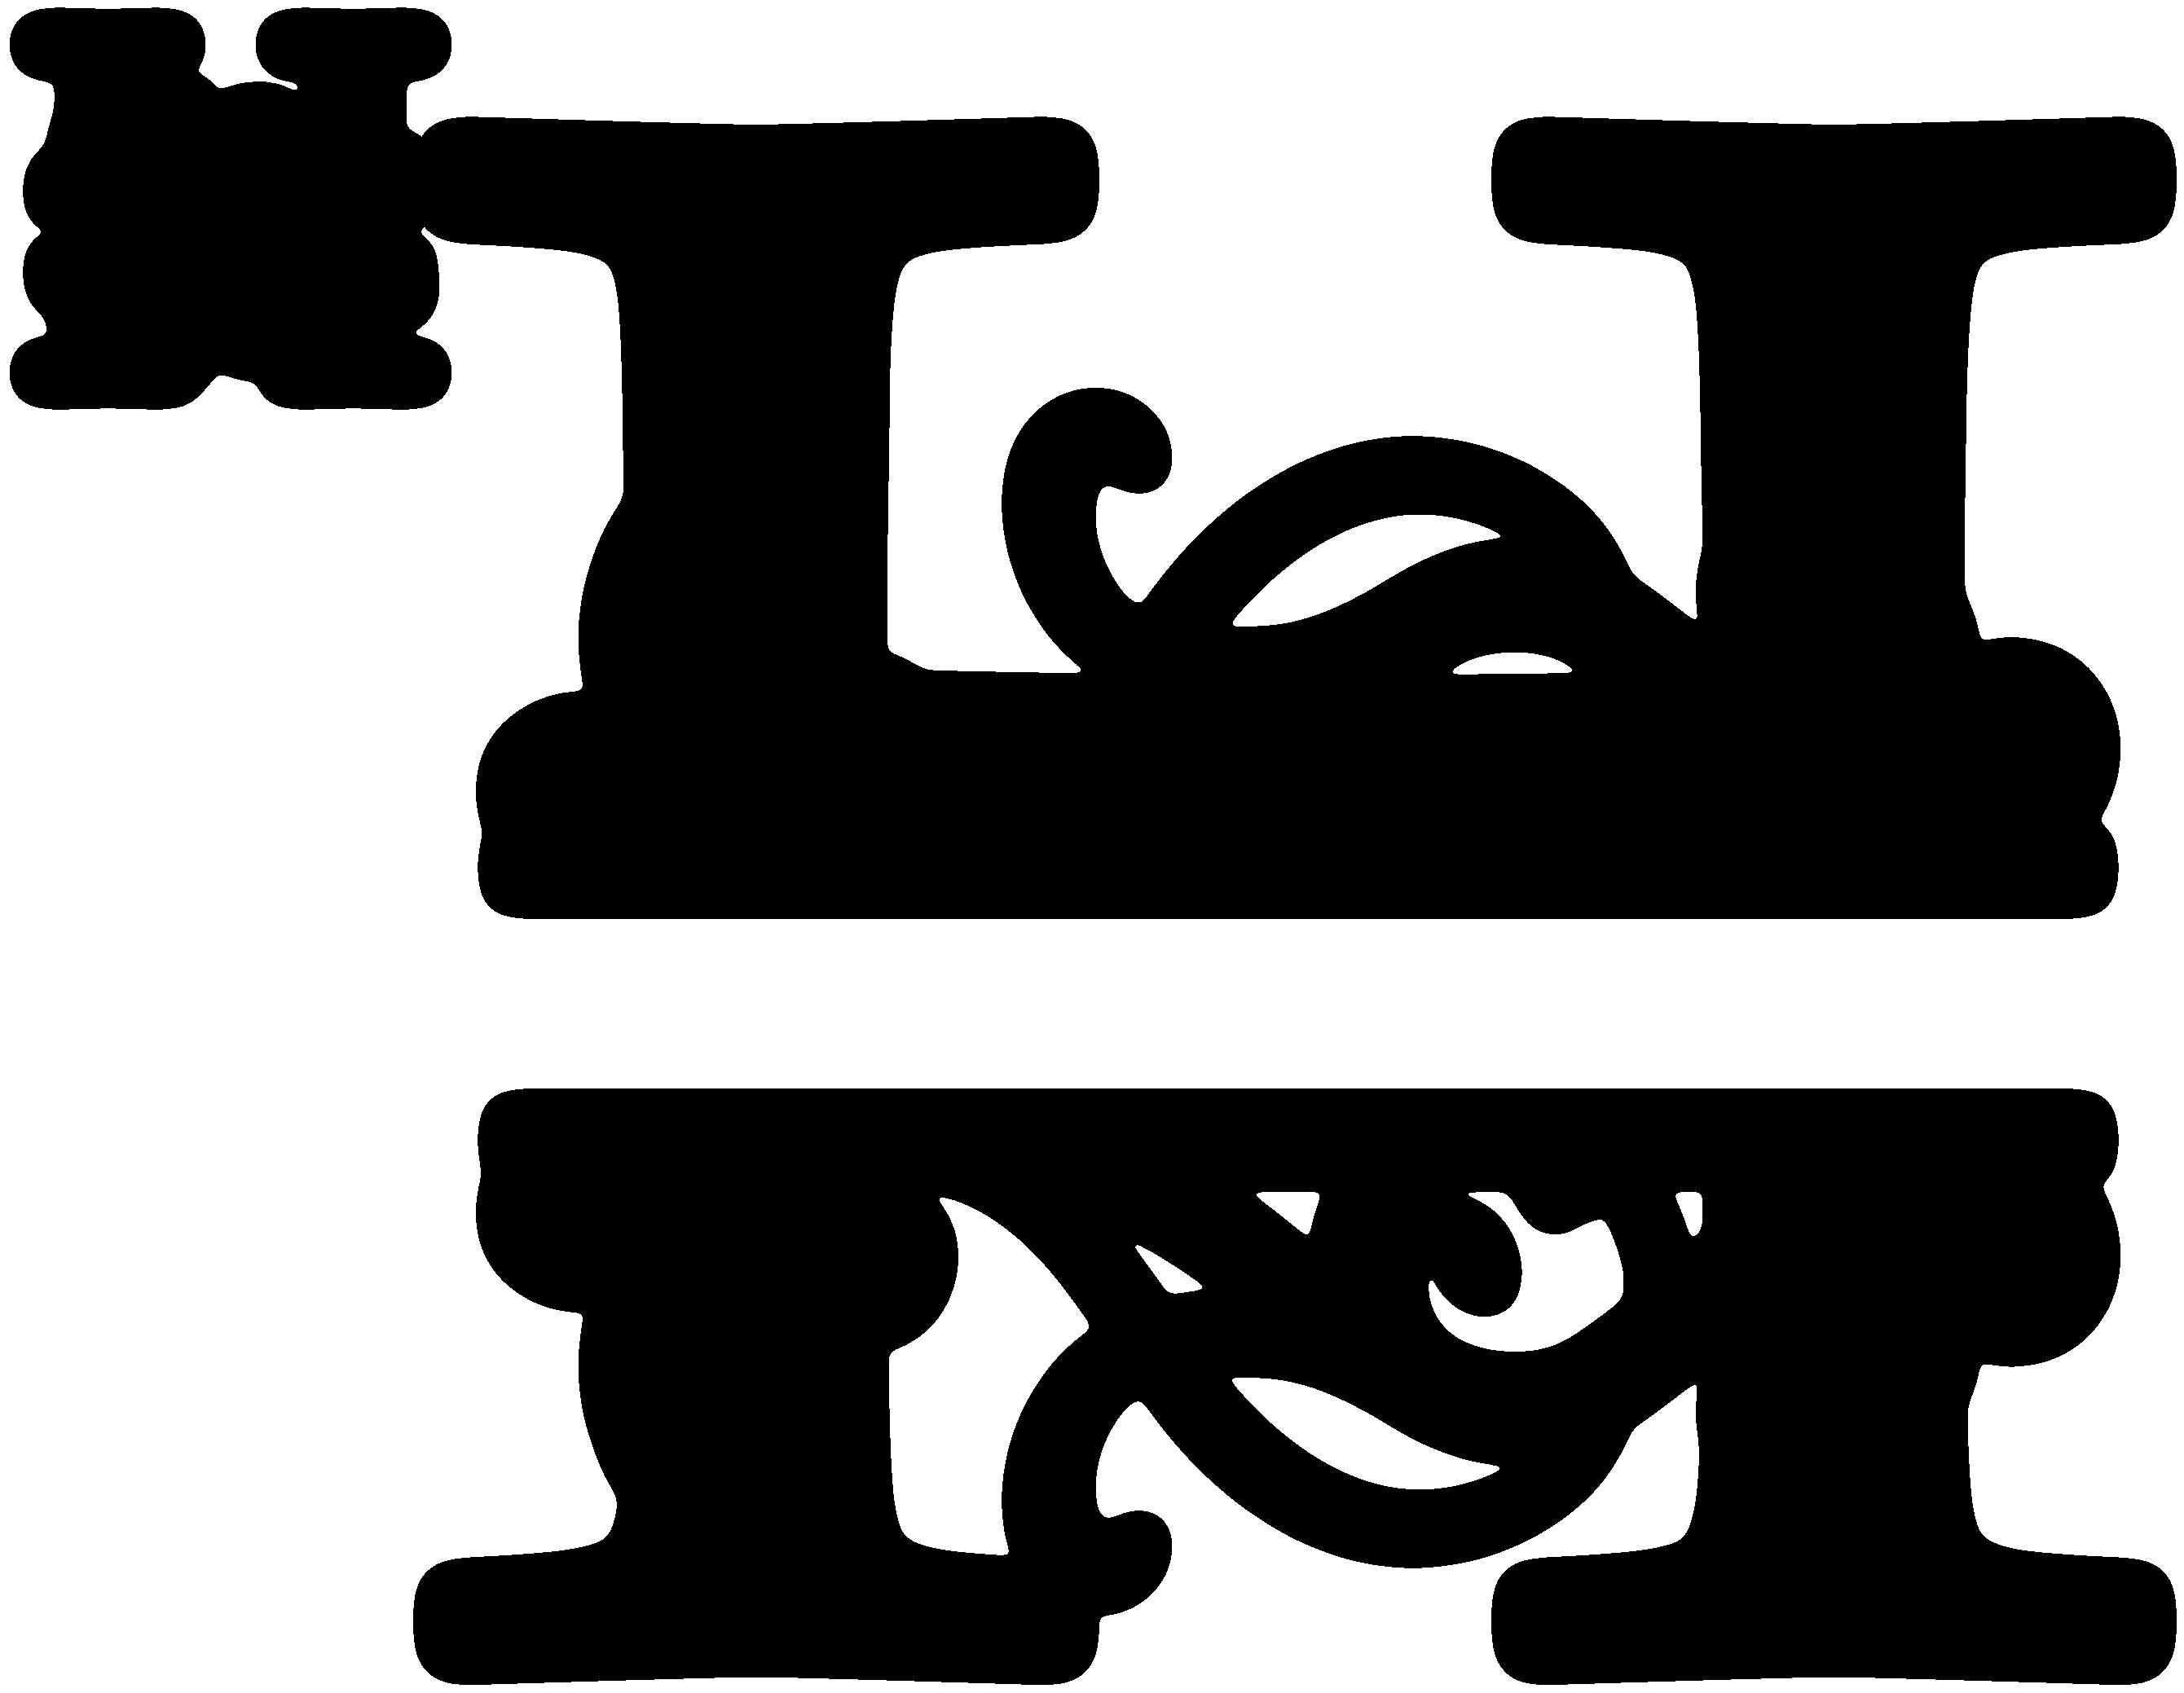 See the source image Cricut monogram, H monogram